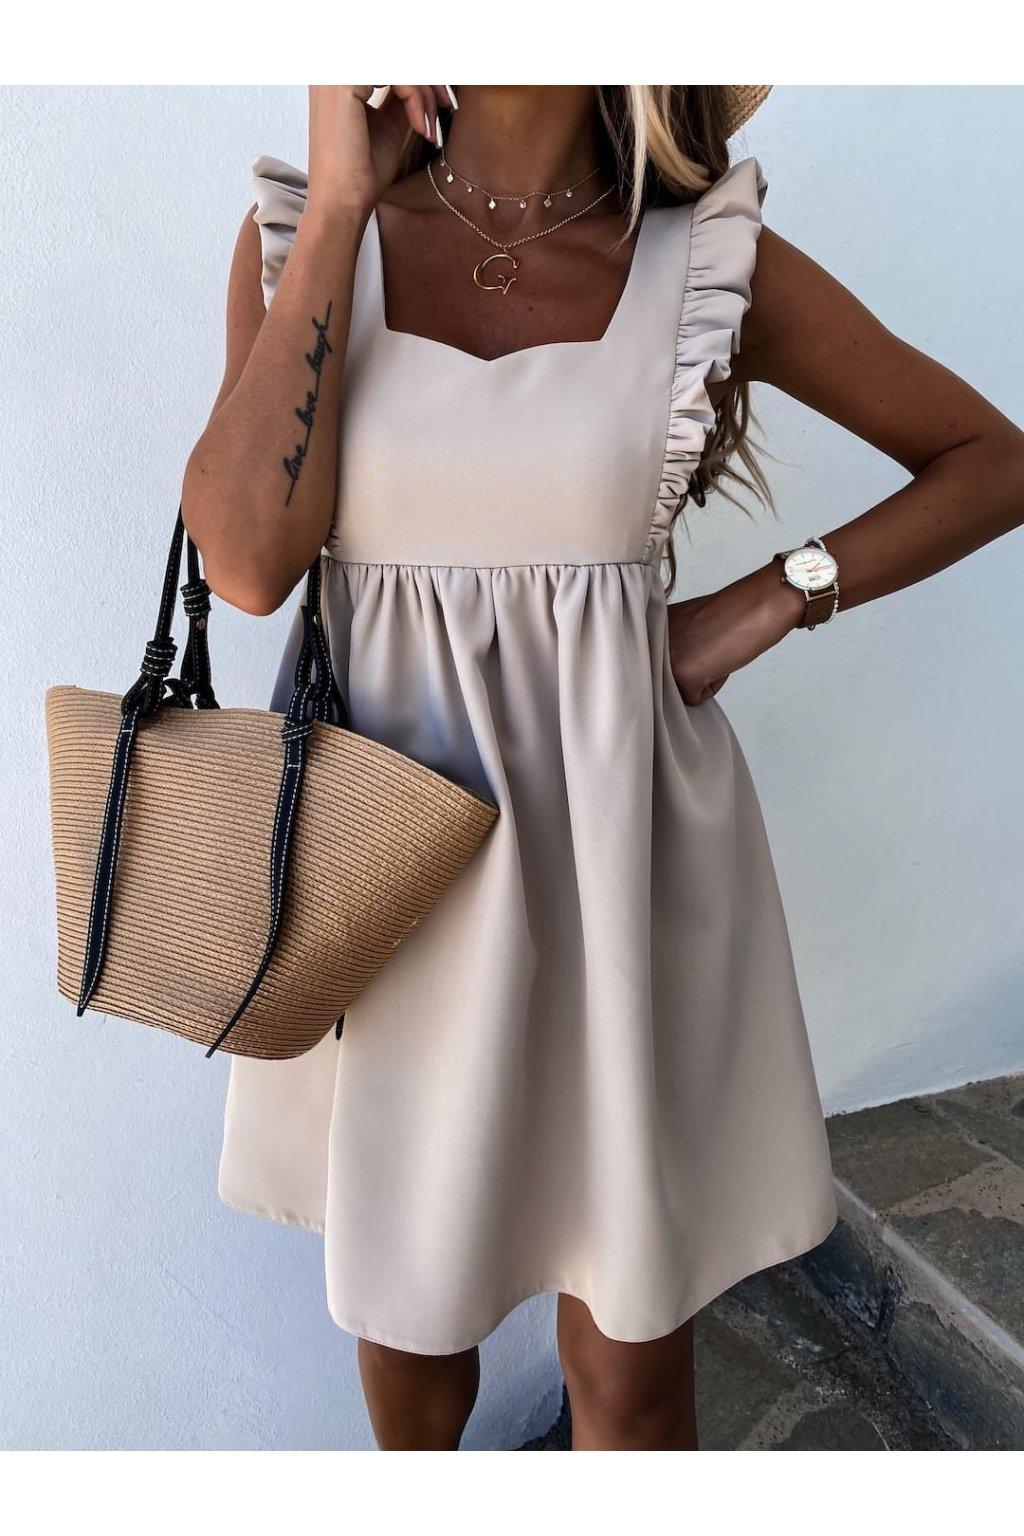 Šaty Madison/barvy